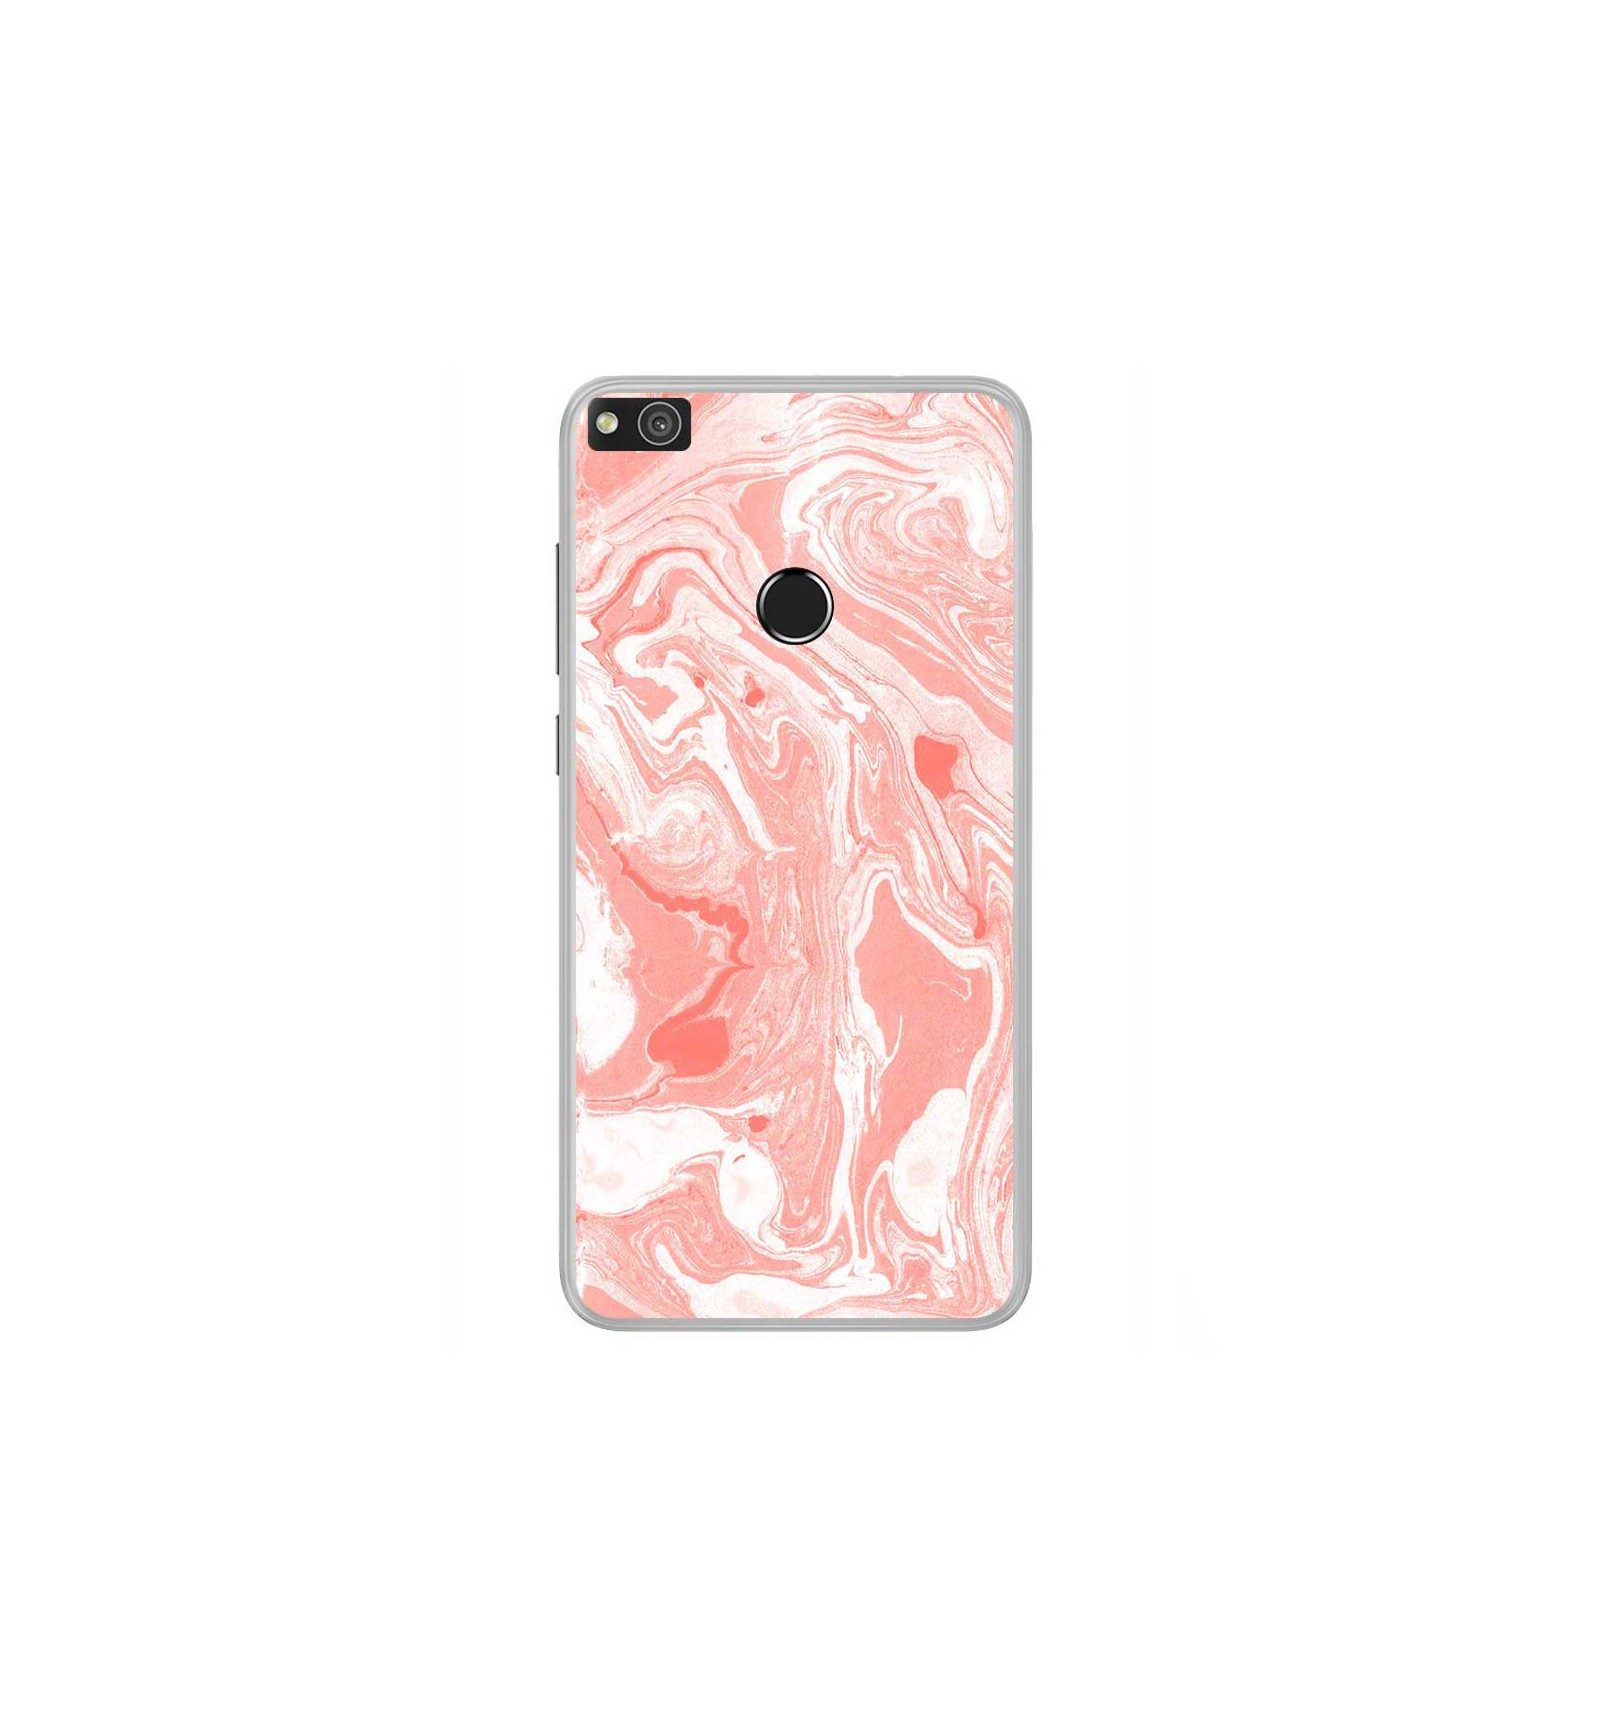 coque silicone rose huawei p8 lite 2017